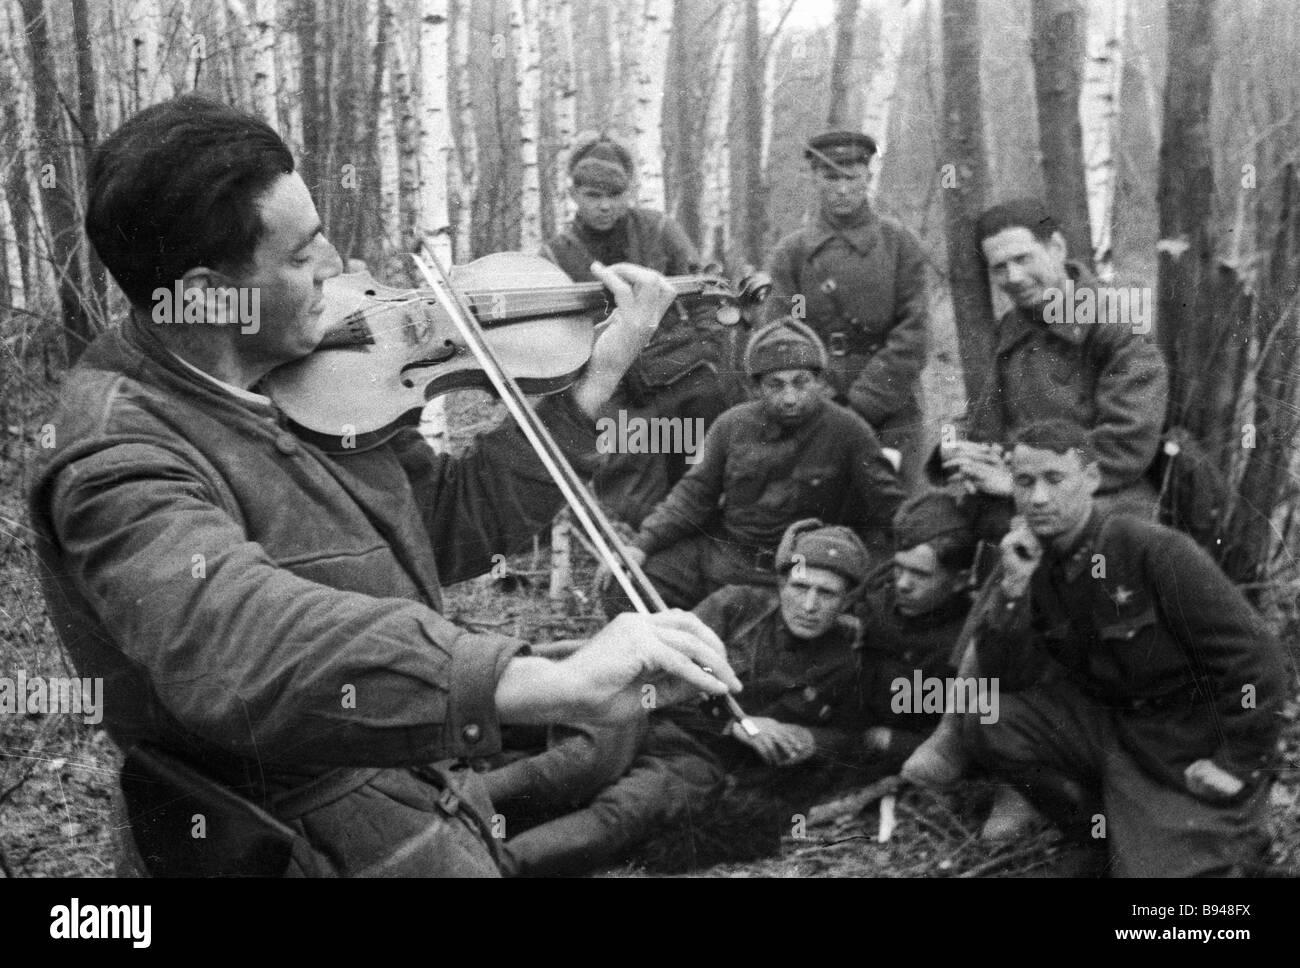 Salomon violoniste joue pour ses camarades Ruzinov in arms Photo Stock